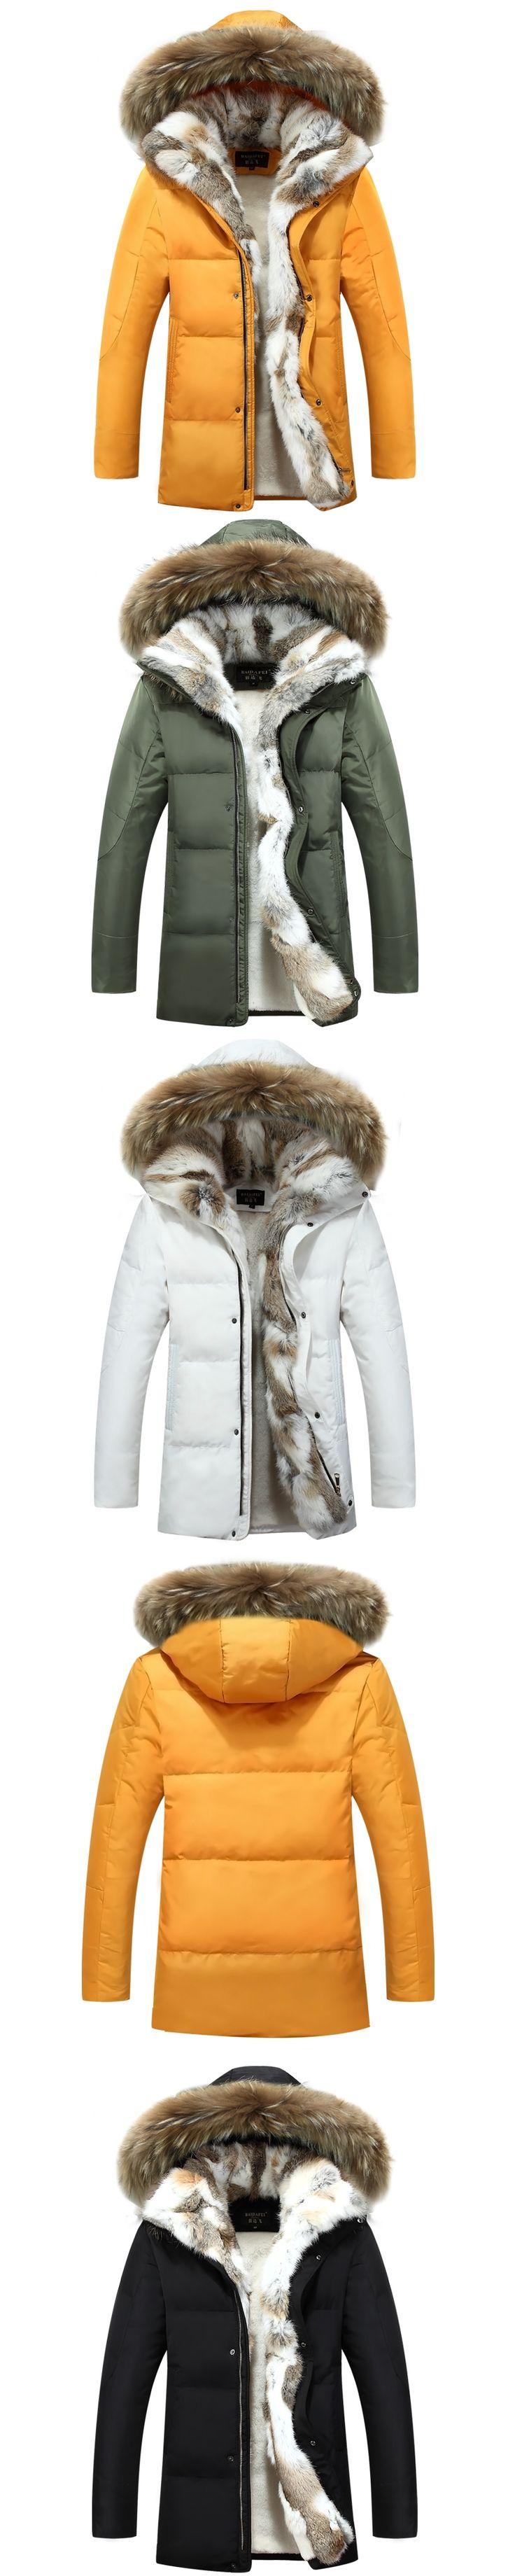 2016 Winter Men's Duck Down Jackets Coats Real Rabbit Fur Men Women Lovers Fashion Thick Warm Parka Mens jaqueta masculina S-5XL